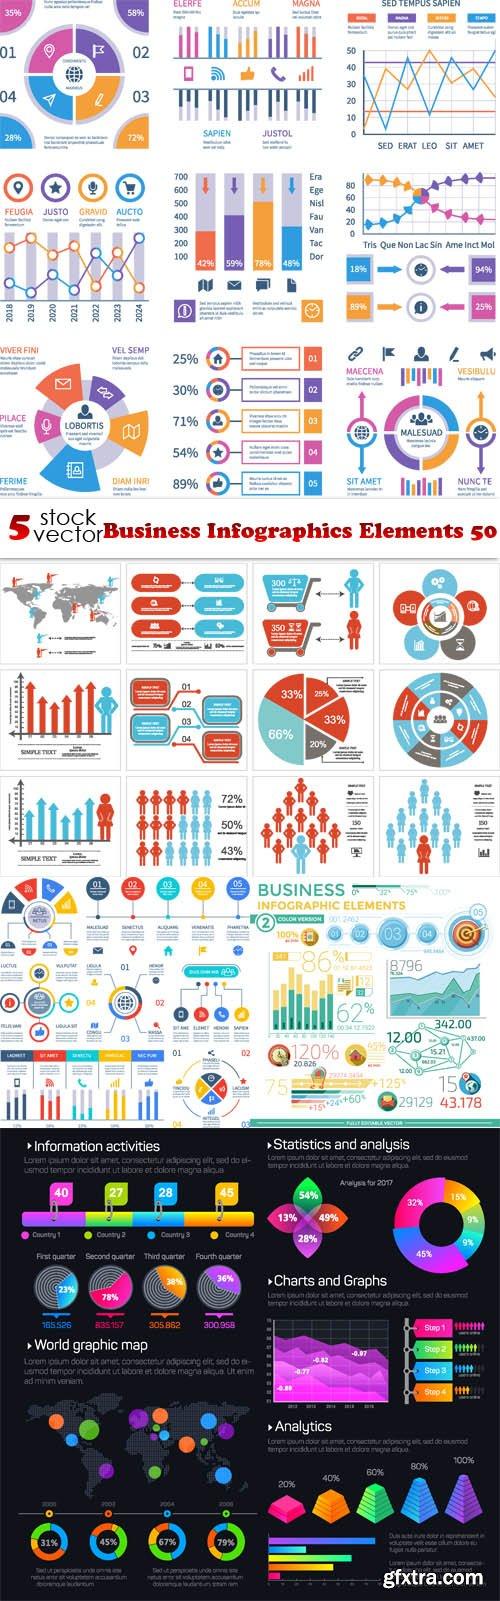 Vectors - Business Infographics Elements 50